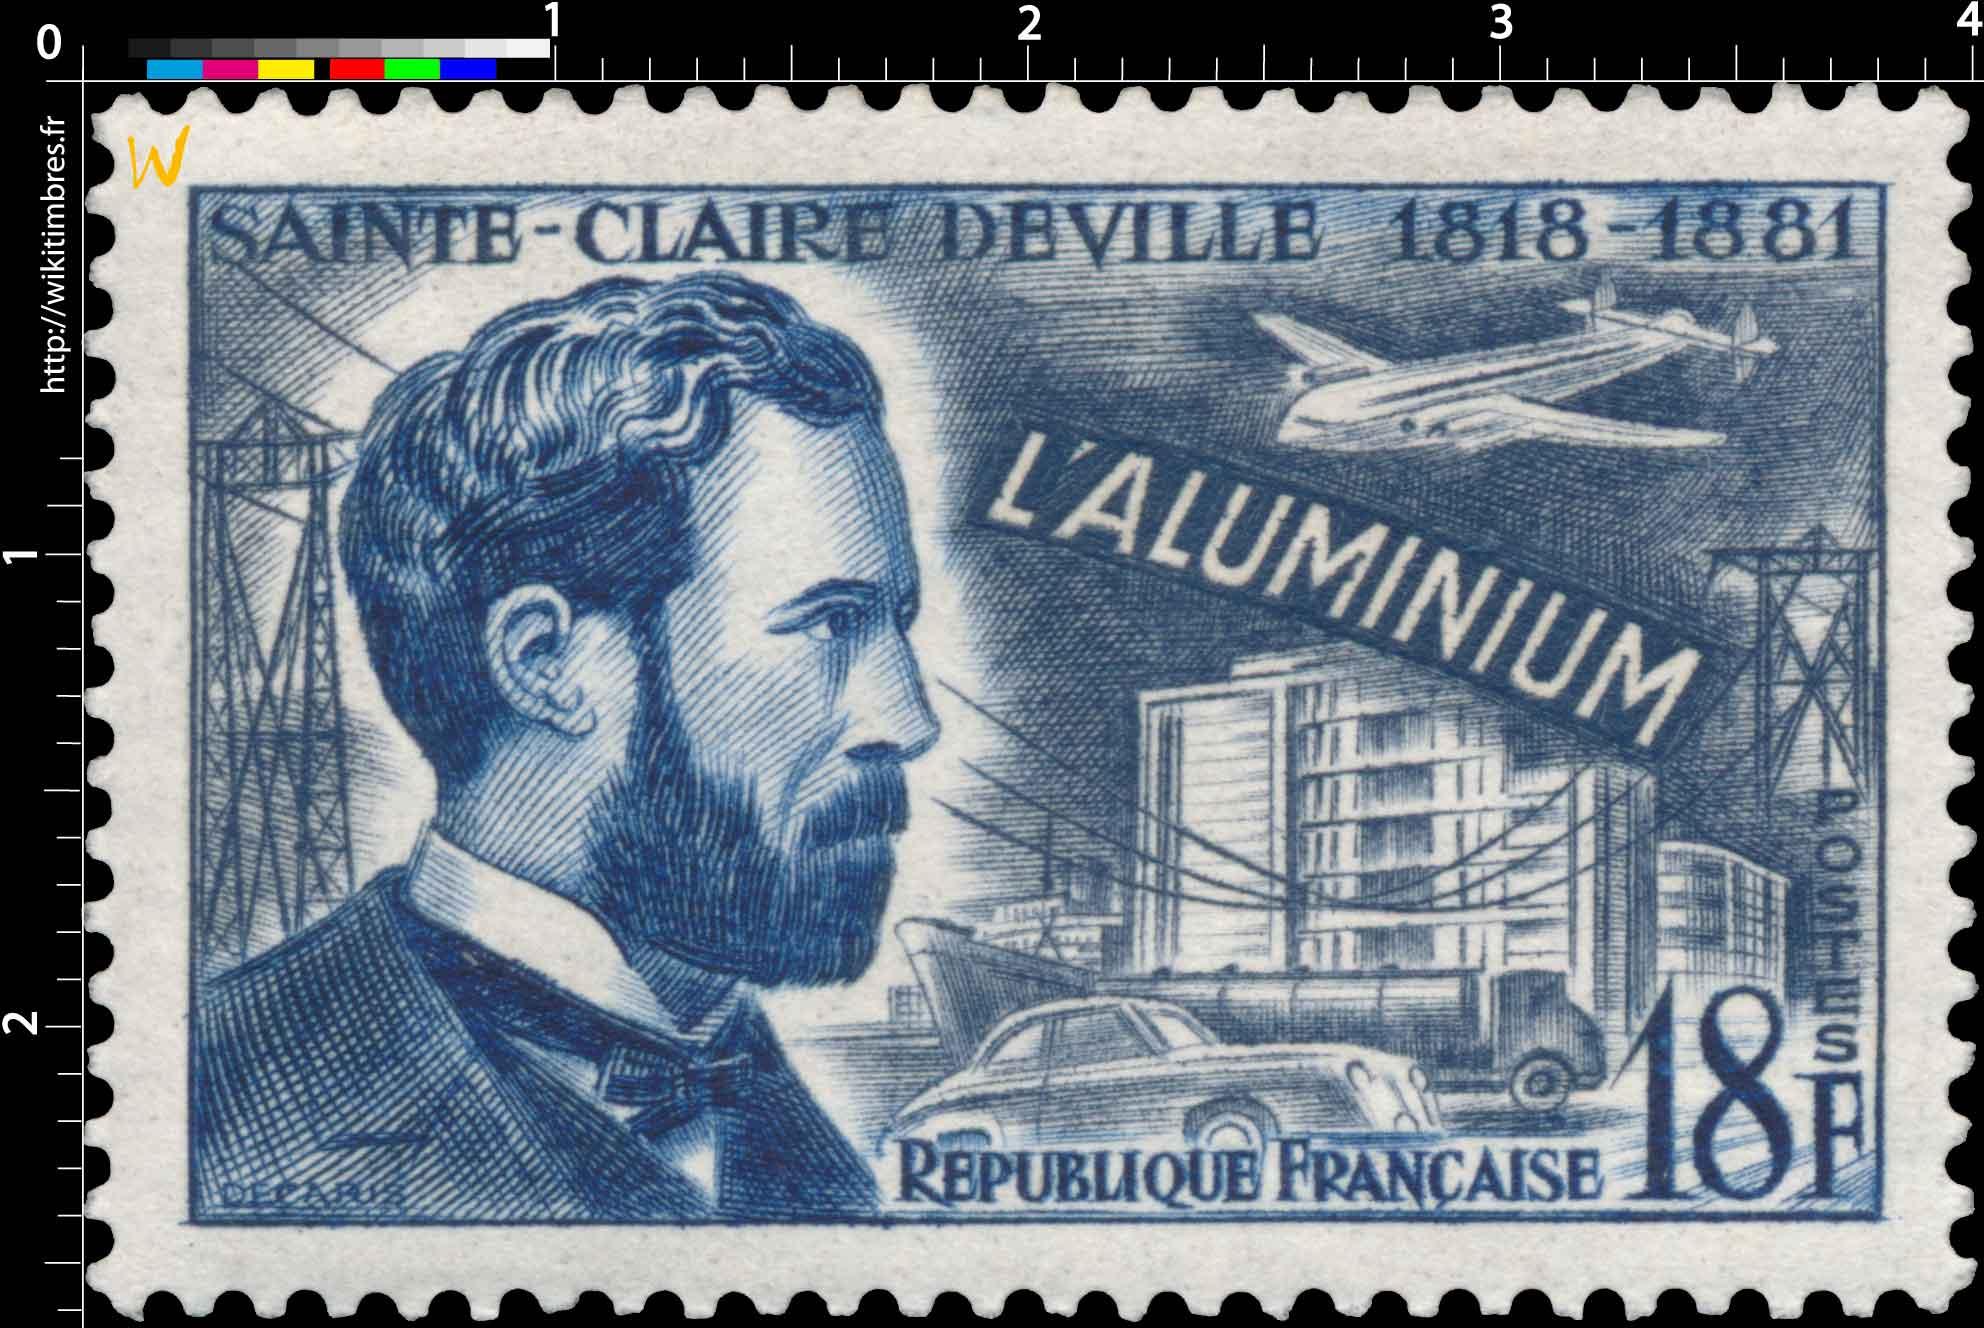 L'ALUMINIUM SAINTE-CLAIRE DEVILLE 1818-1881